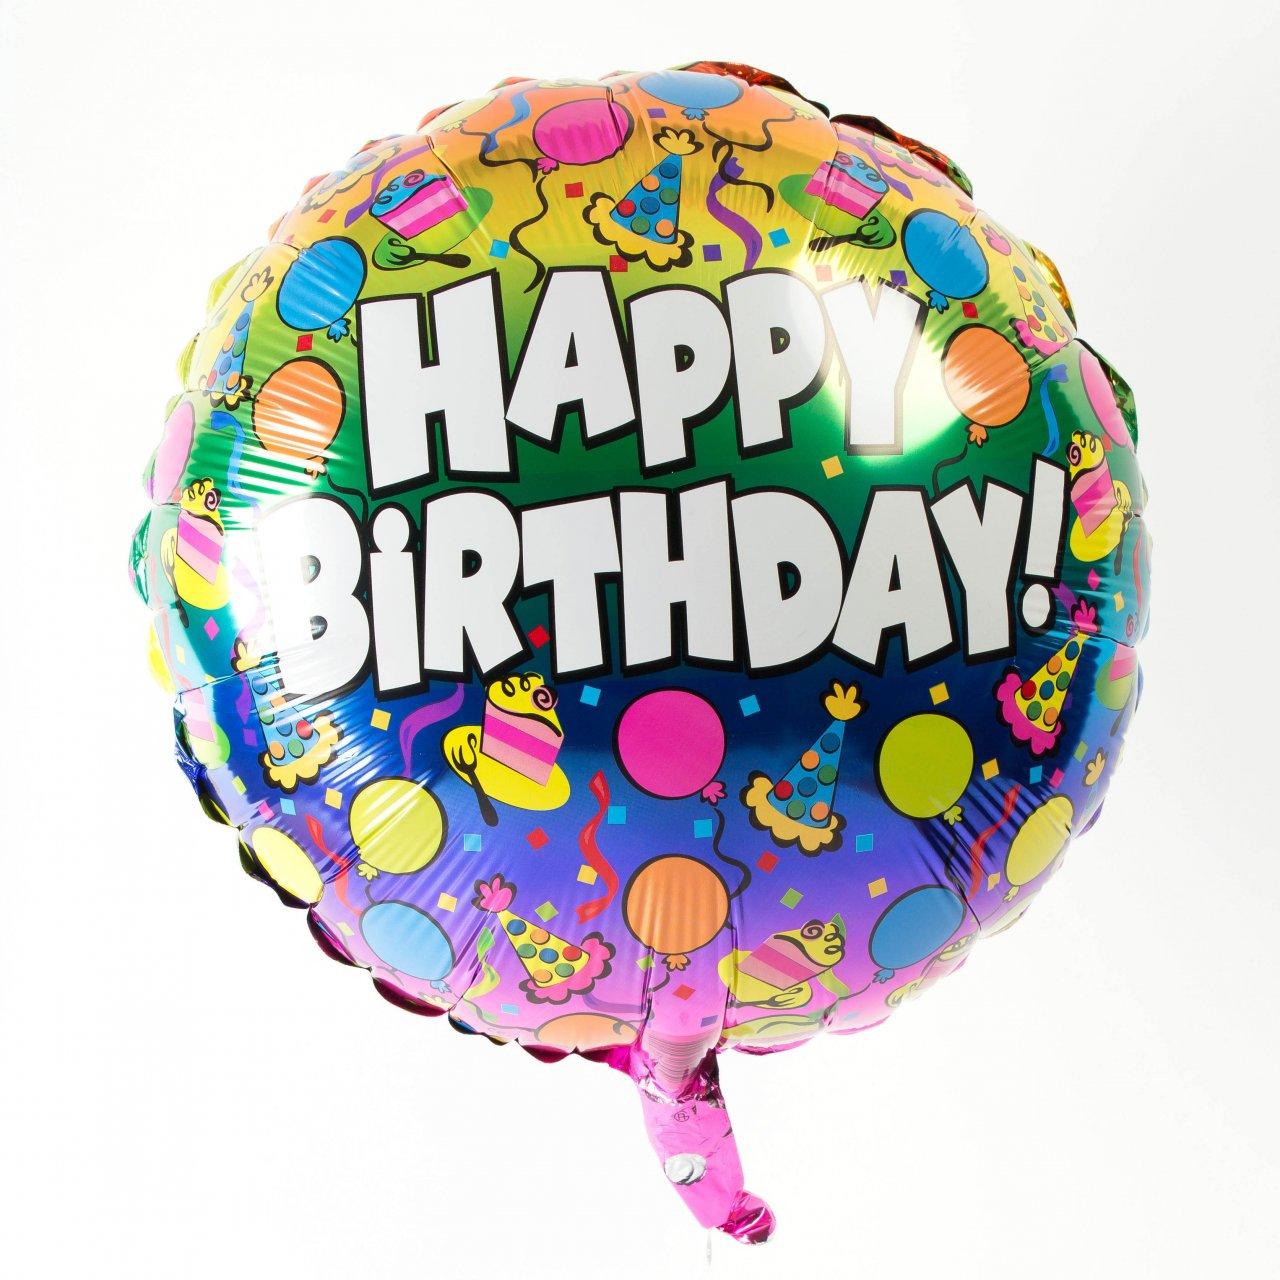 1280x1280 Happy Birthday Balloon North Flowers